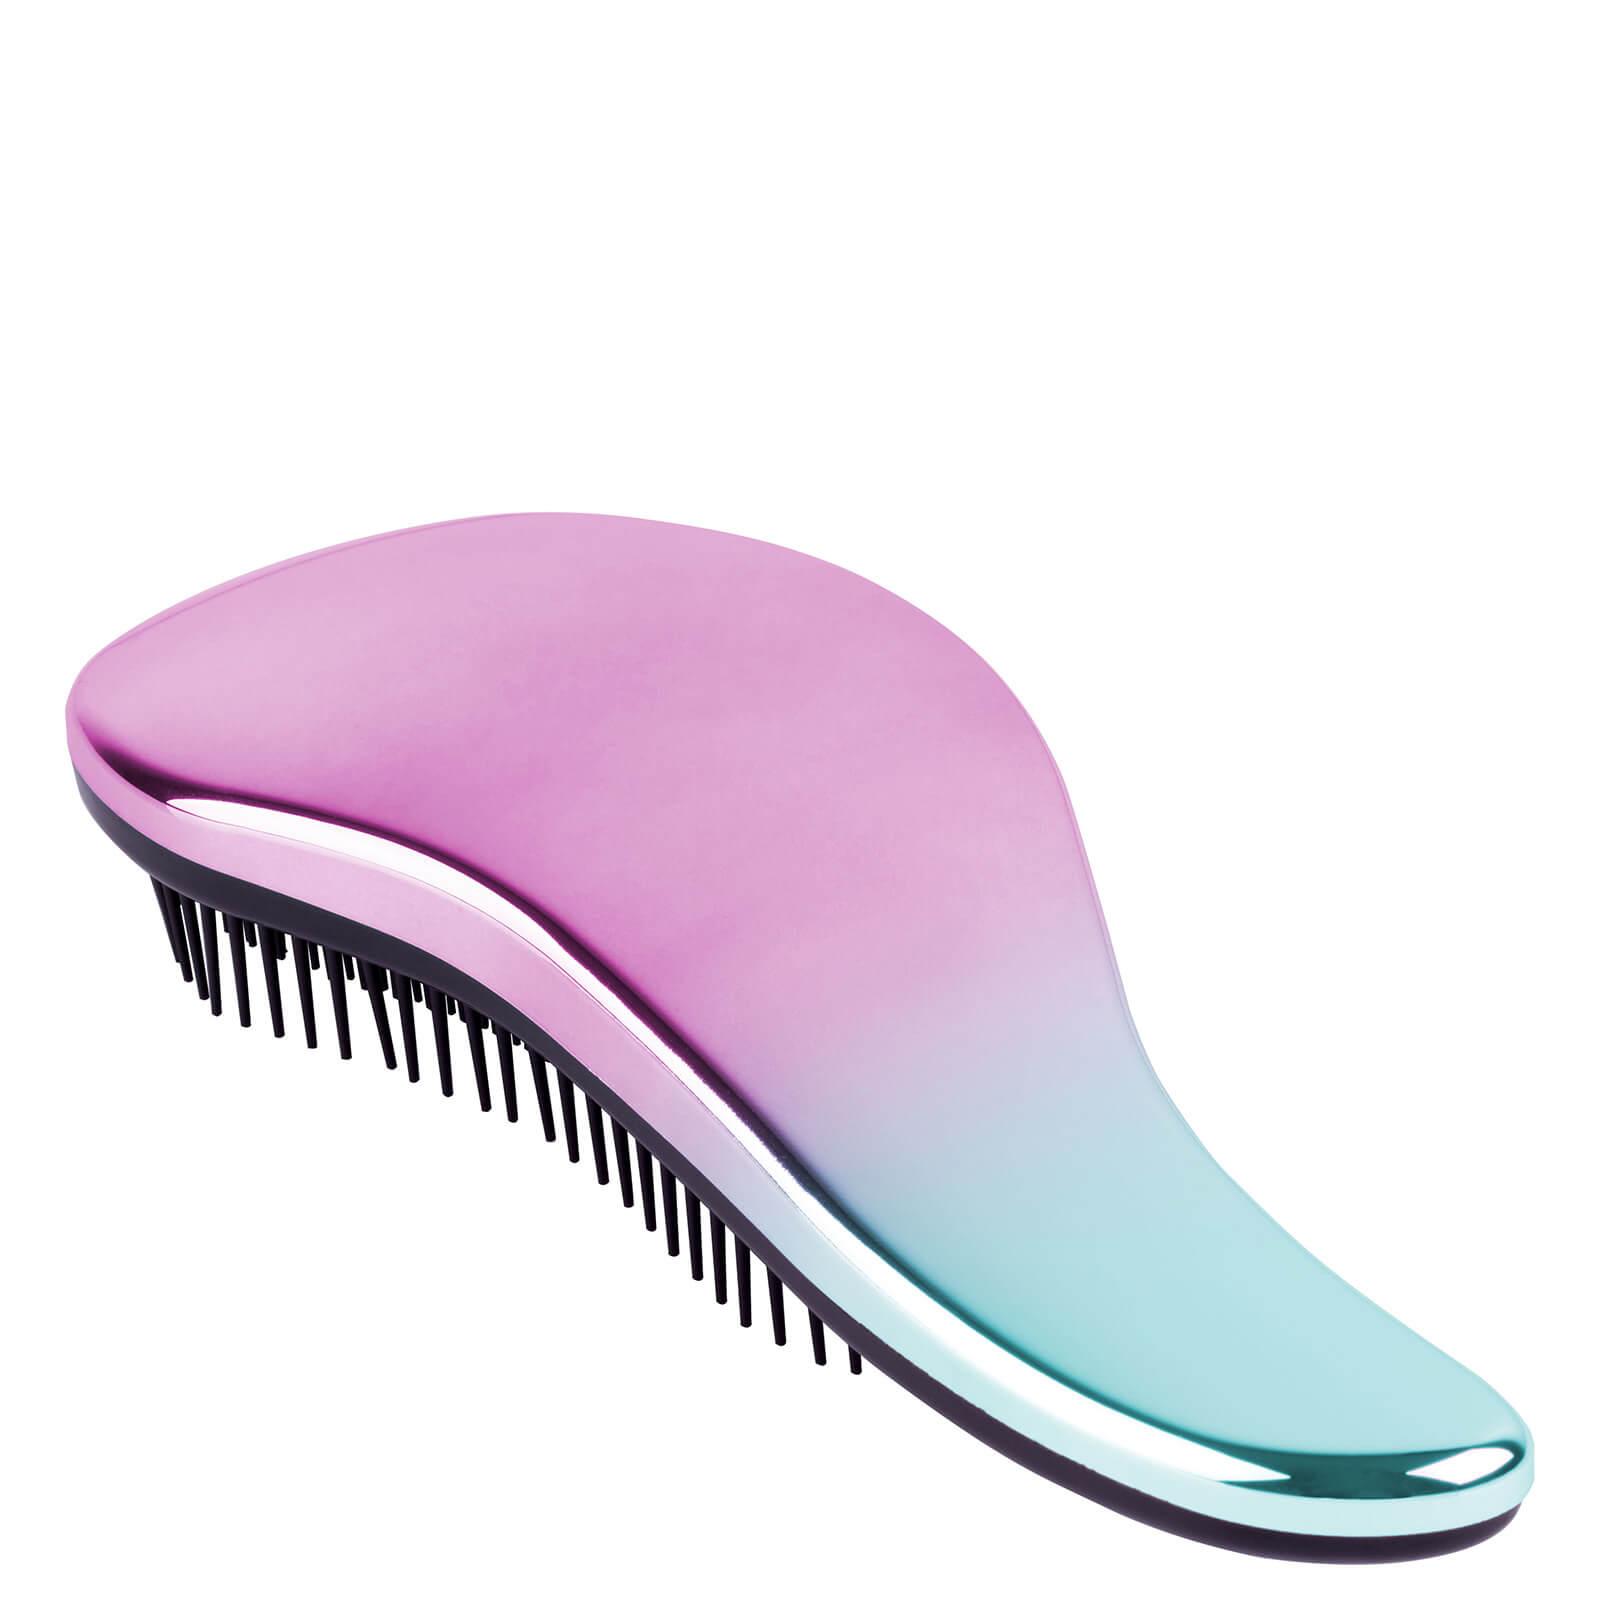 Купить Щетка для распутывания волос brushworks HD Detangling Hair Brush